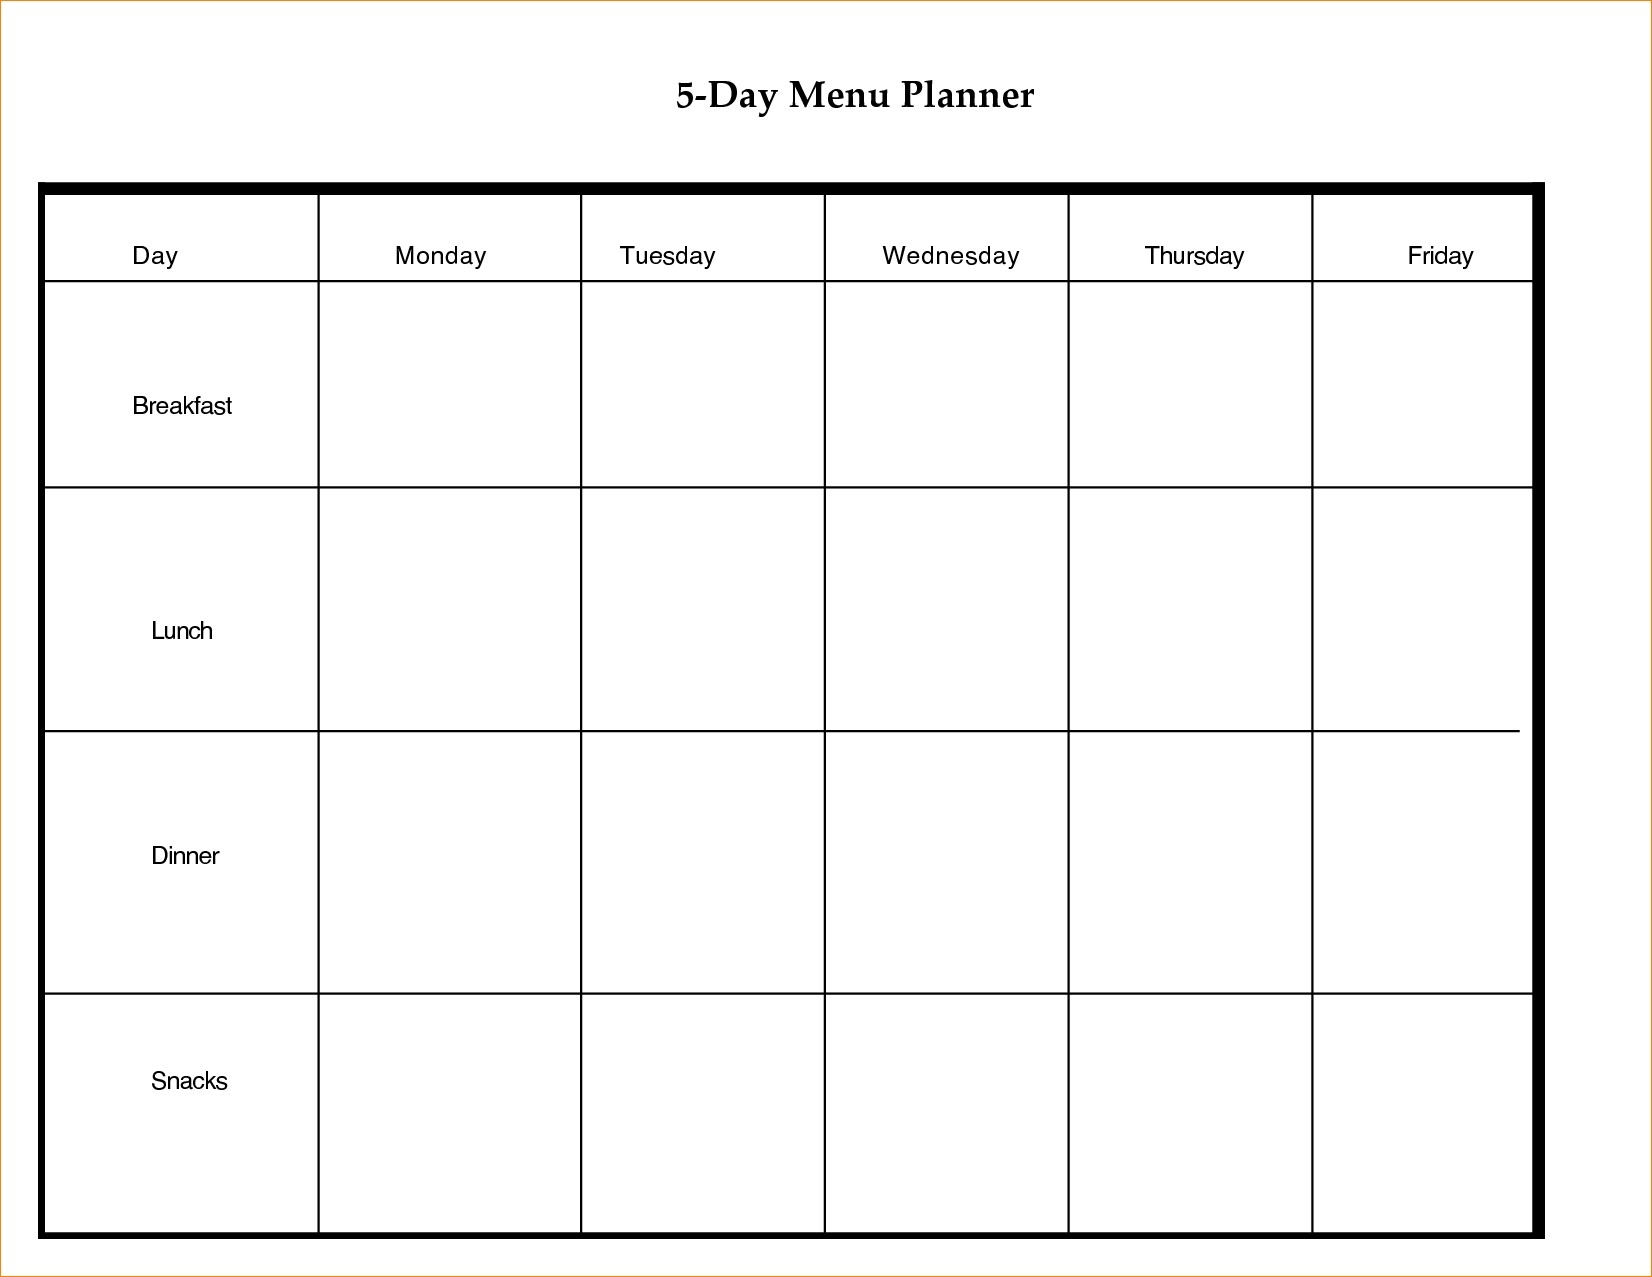 Printable 5 Day Calendar Blank Calendar Template 5 Day Week 0 8 With inside 5 Day Blank Calendar Printable